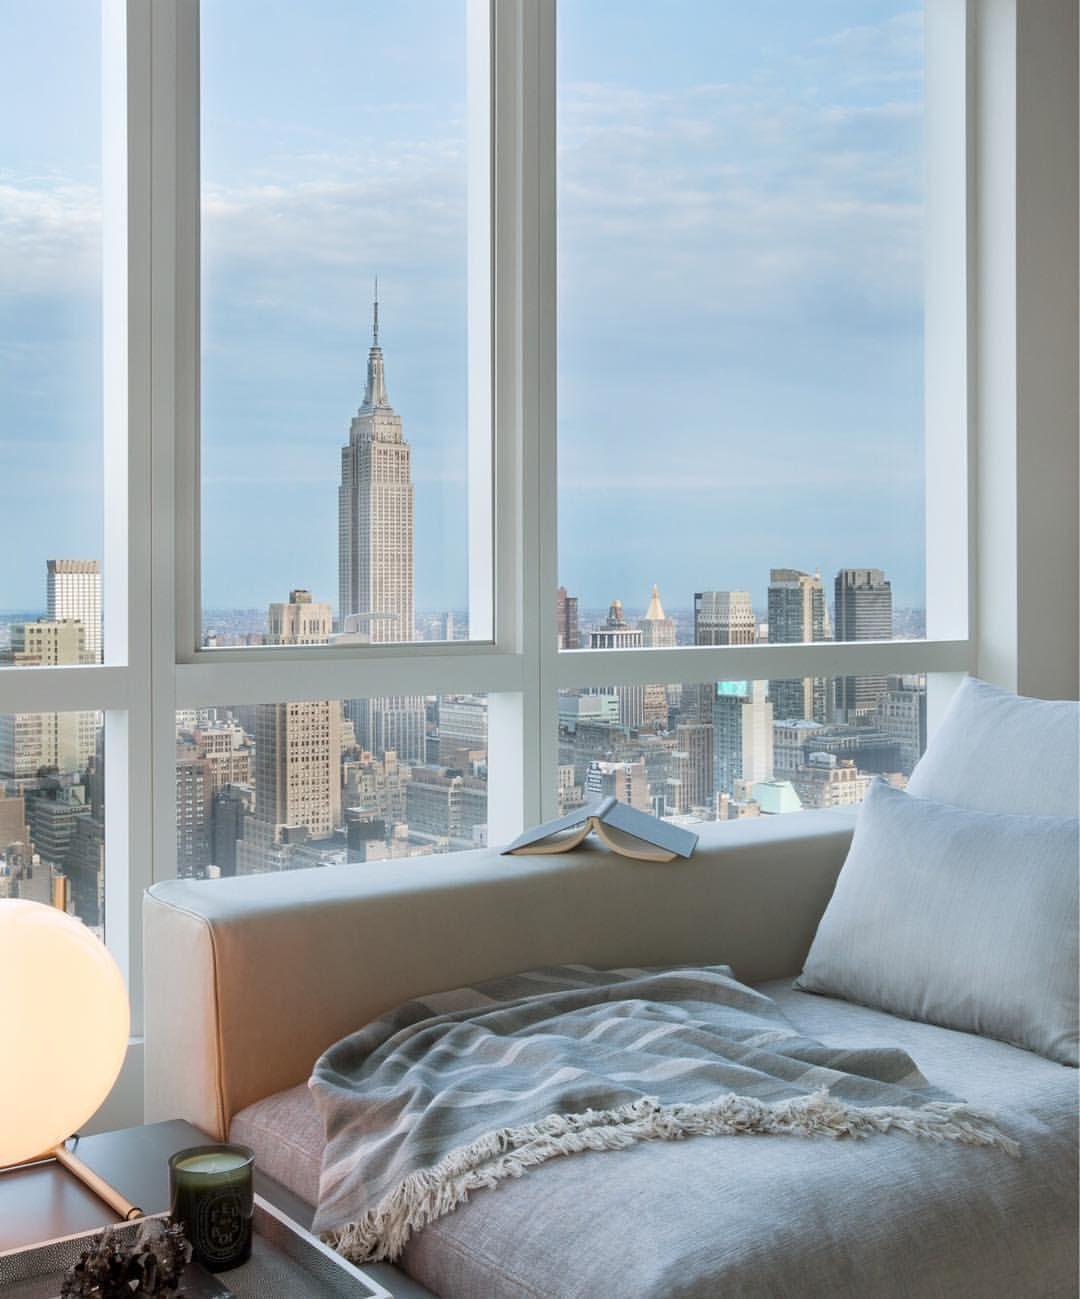 Manhattan Condo Staycation Cubao Home: Manhattan View, Luxury Condos (@manhattanviewatmima) On